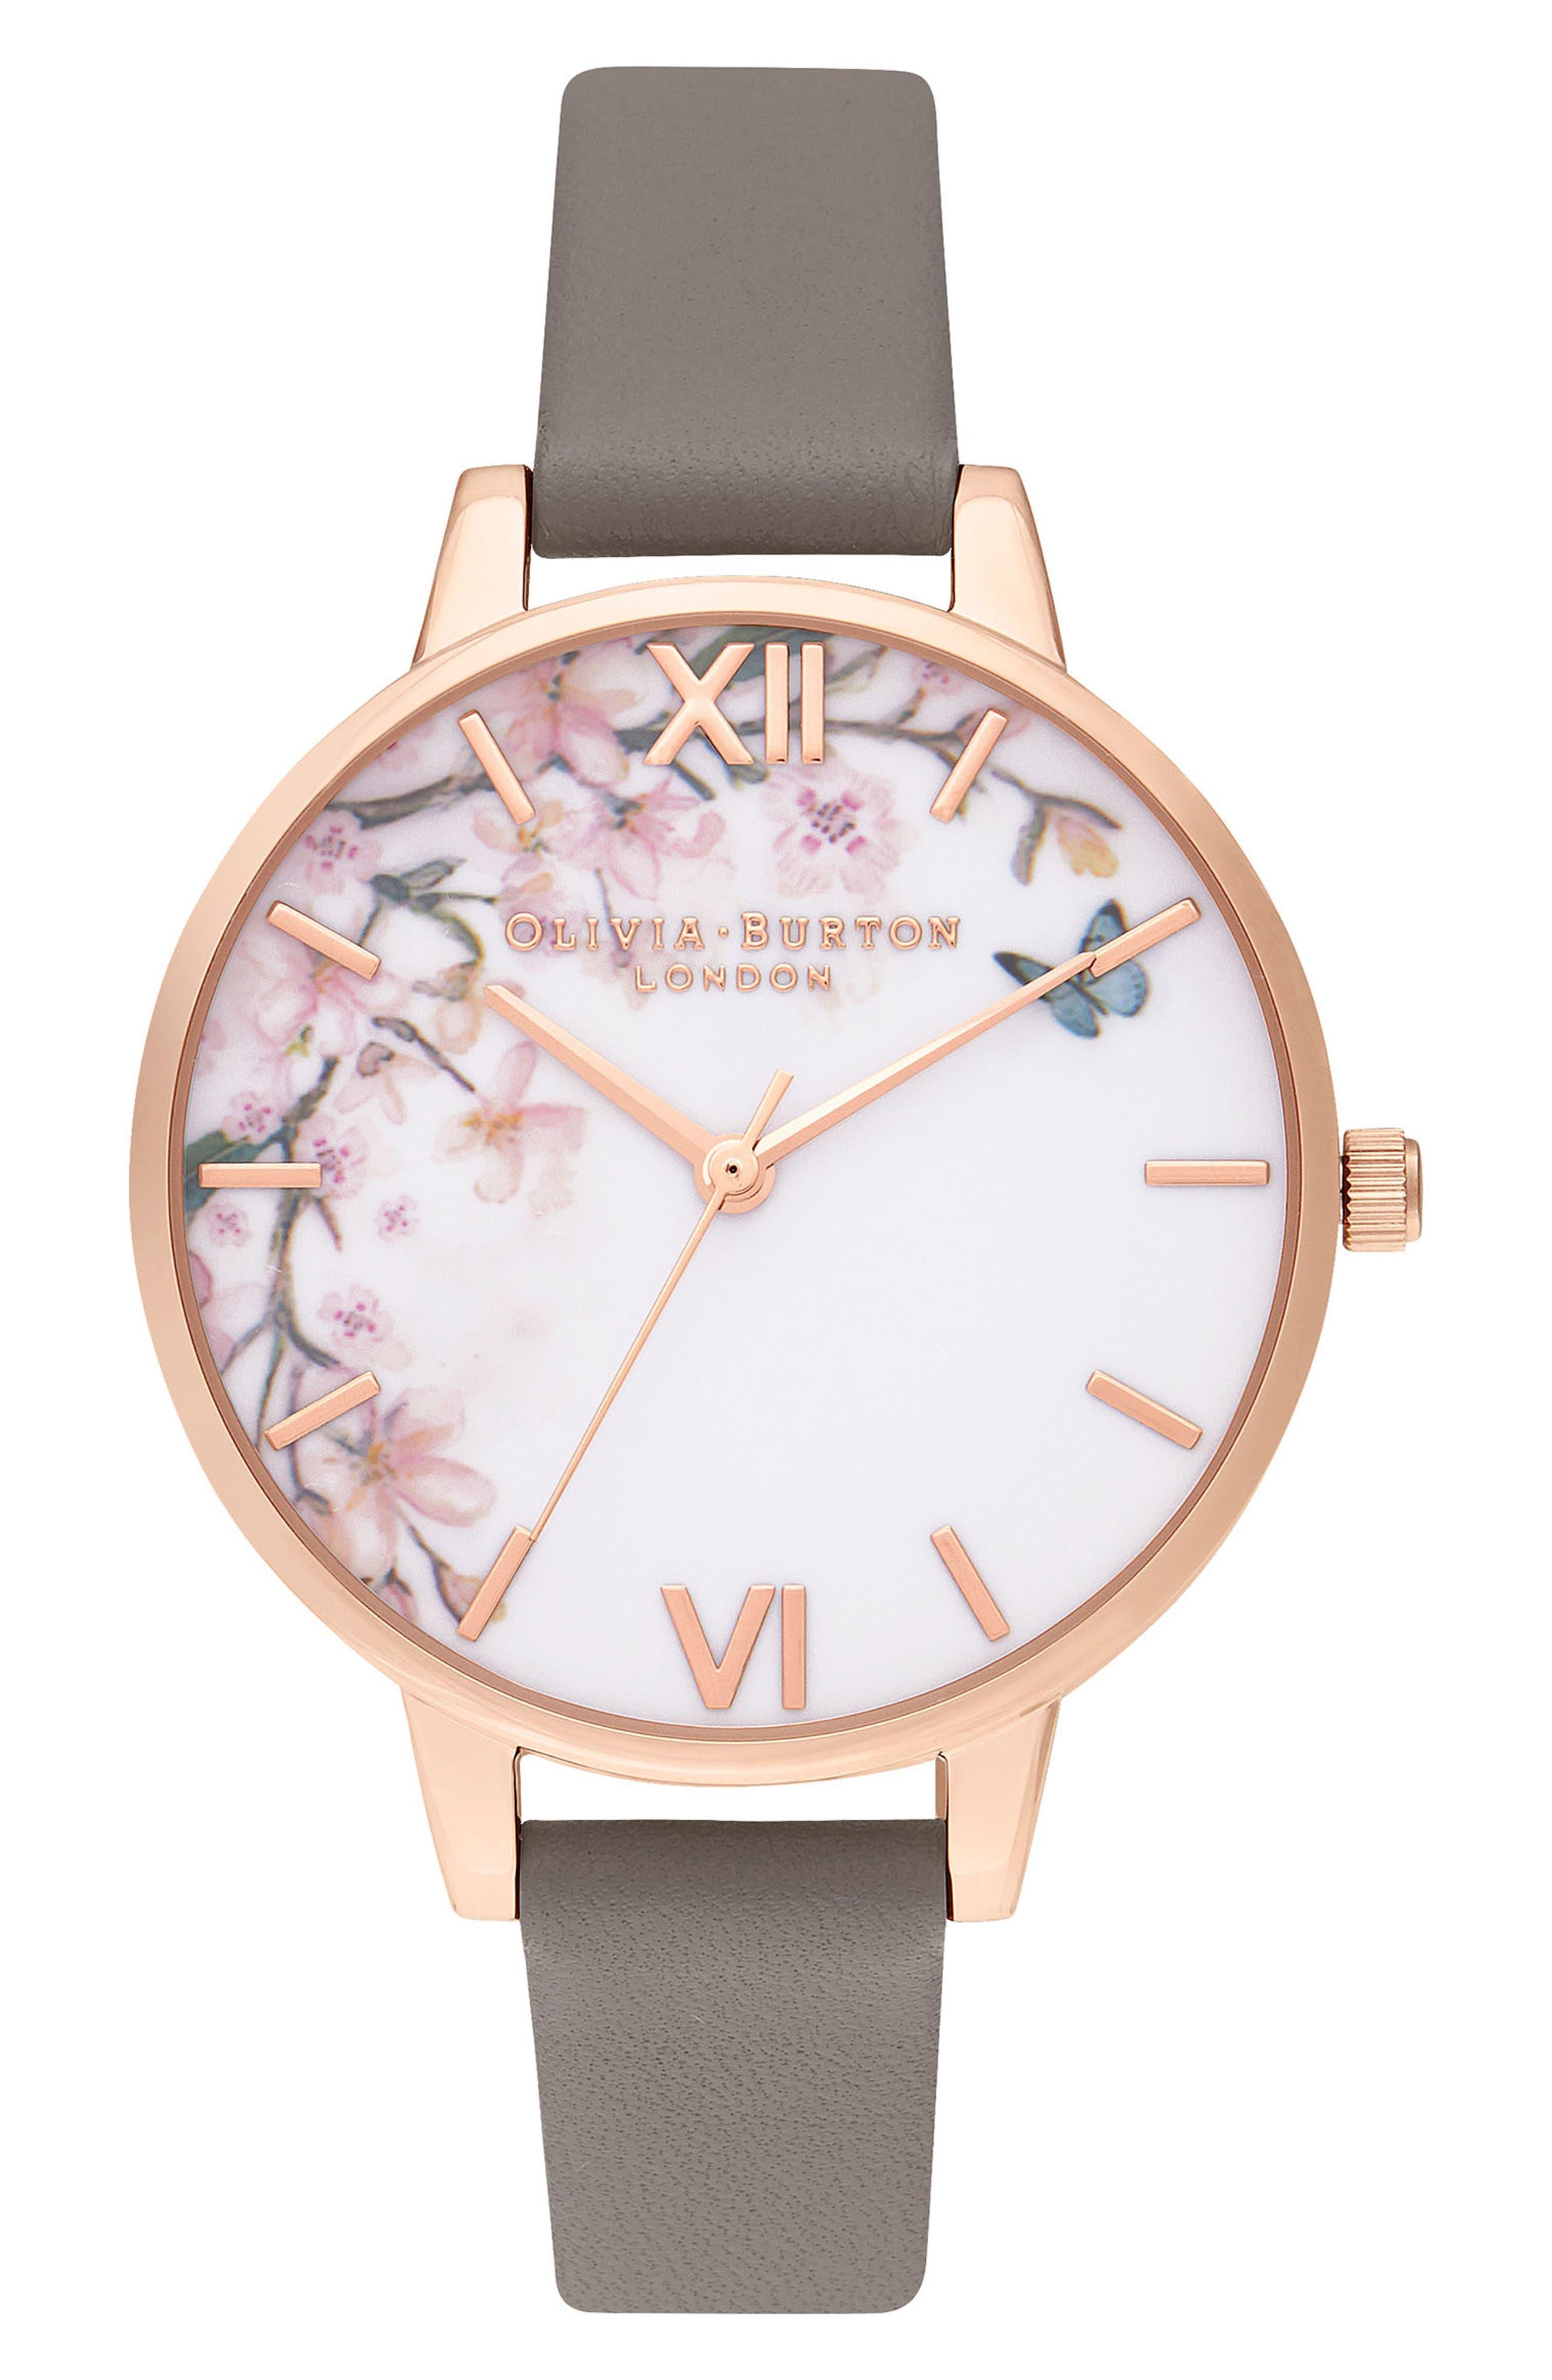 OLIVIA BURTON Pretty Blossom Leather Strap Watch, 34mm, Main, color, GREY / WHITE/ ROSE GOLD